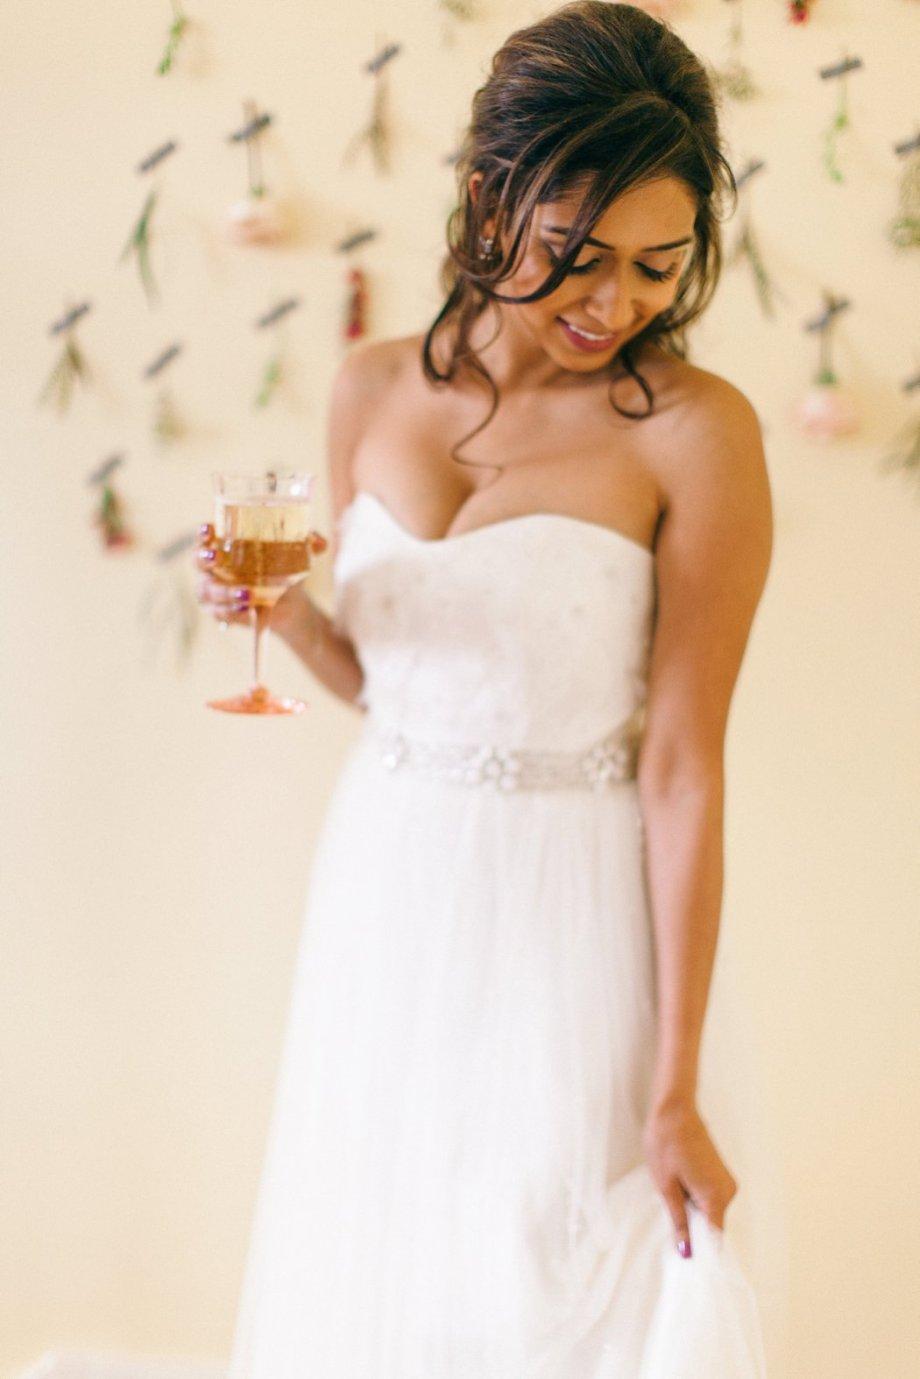 Amanda_Burnette_Richmond_wedding_florist_wedding_organic_flowers_bridal Portrait_Boudoir photo_0005.jpg